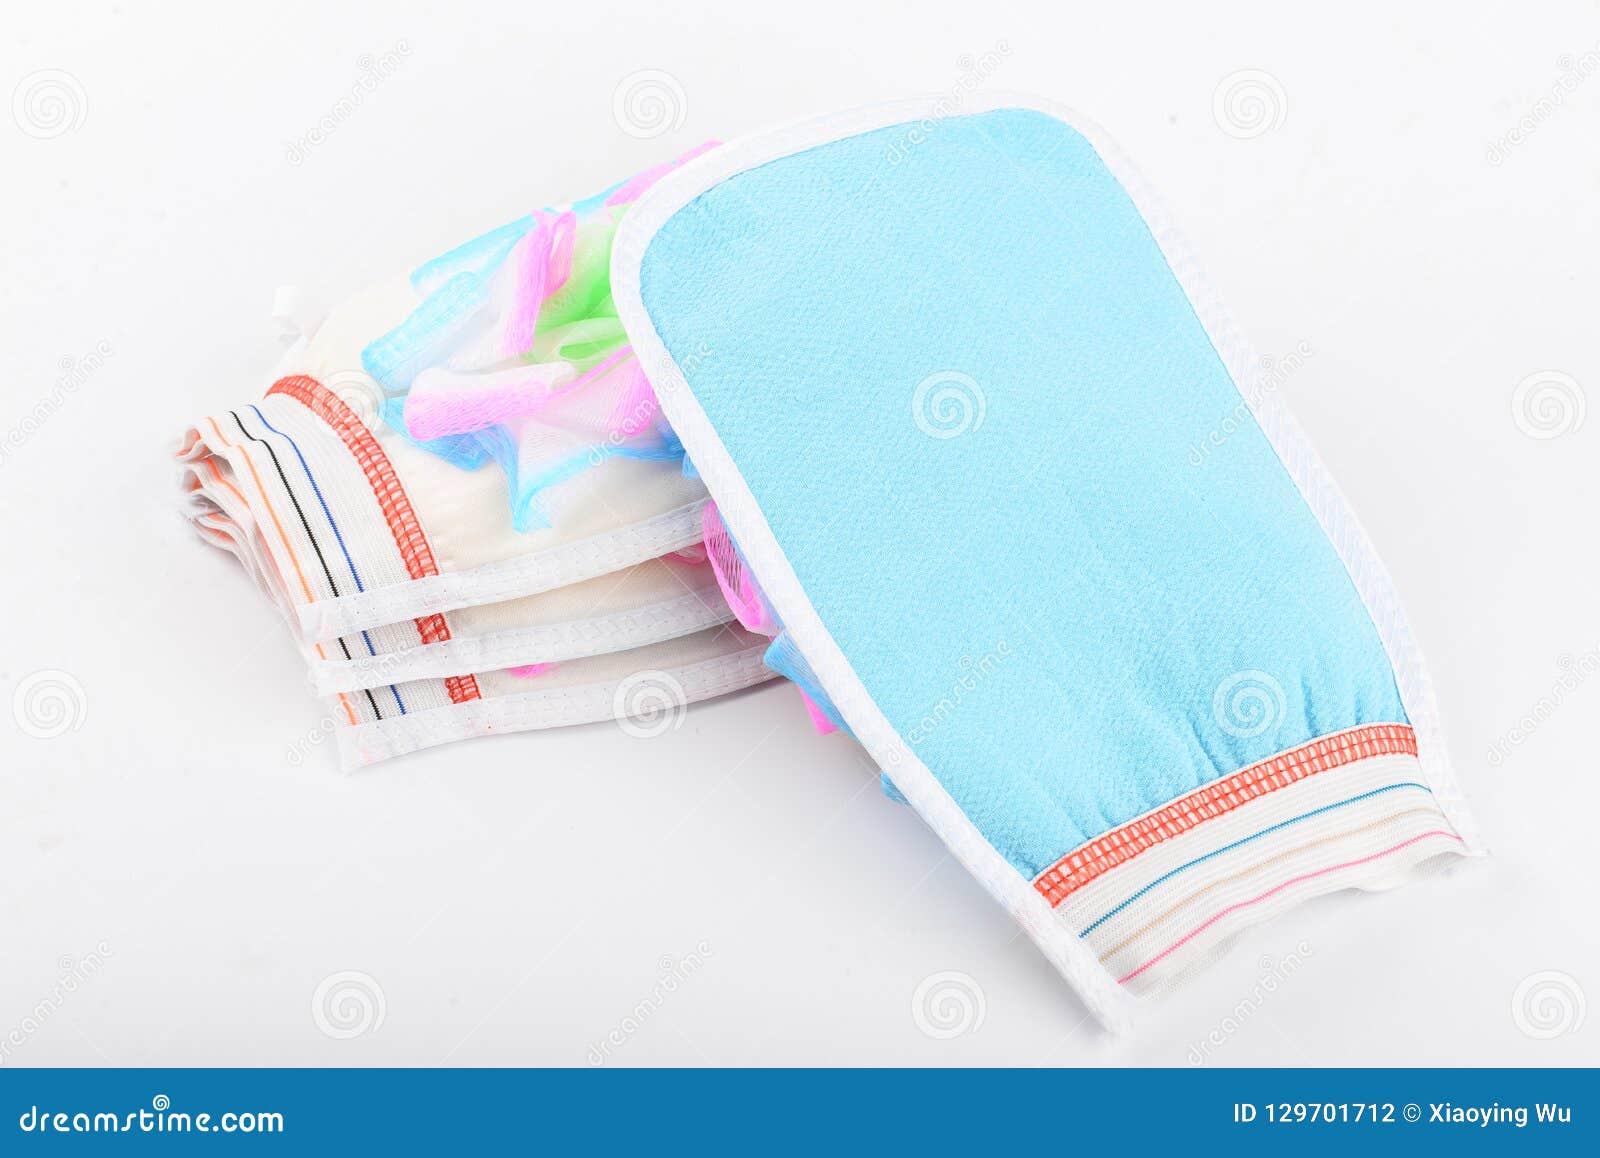 Smooth Skin Cleaner Body Rub Shower Scrubber Bath Glove Exfoliating Towel